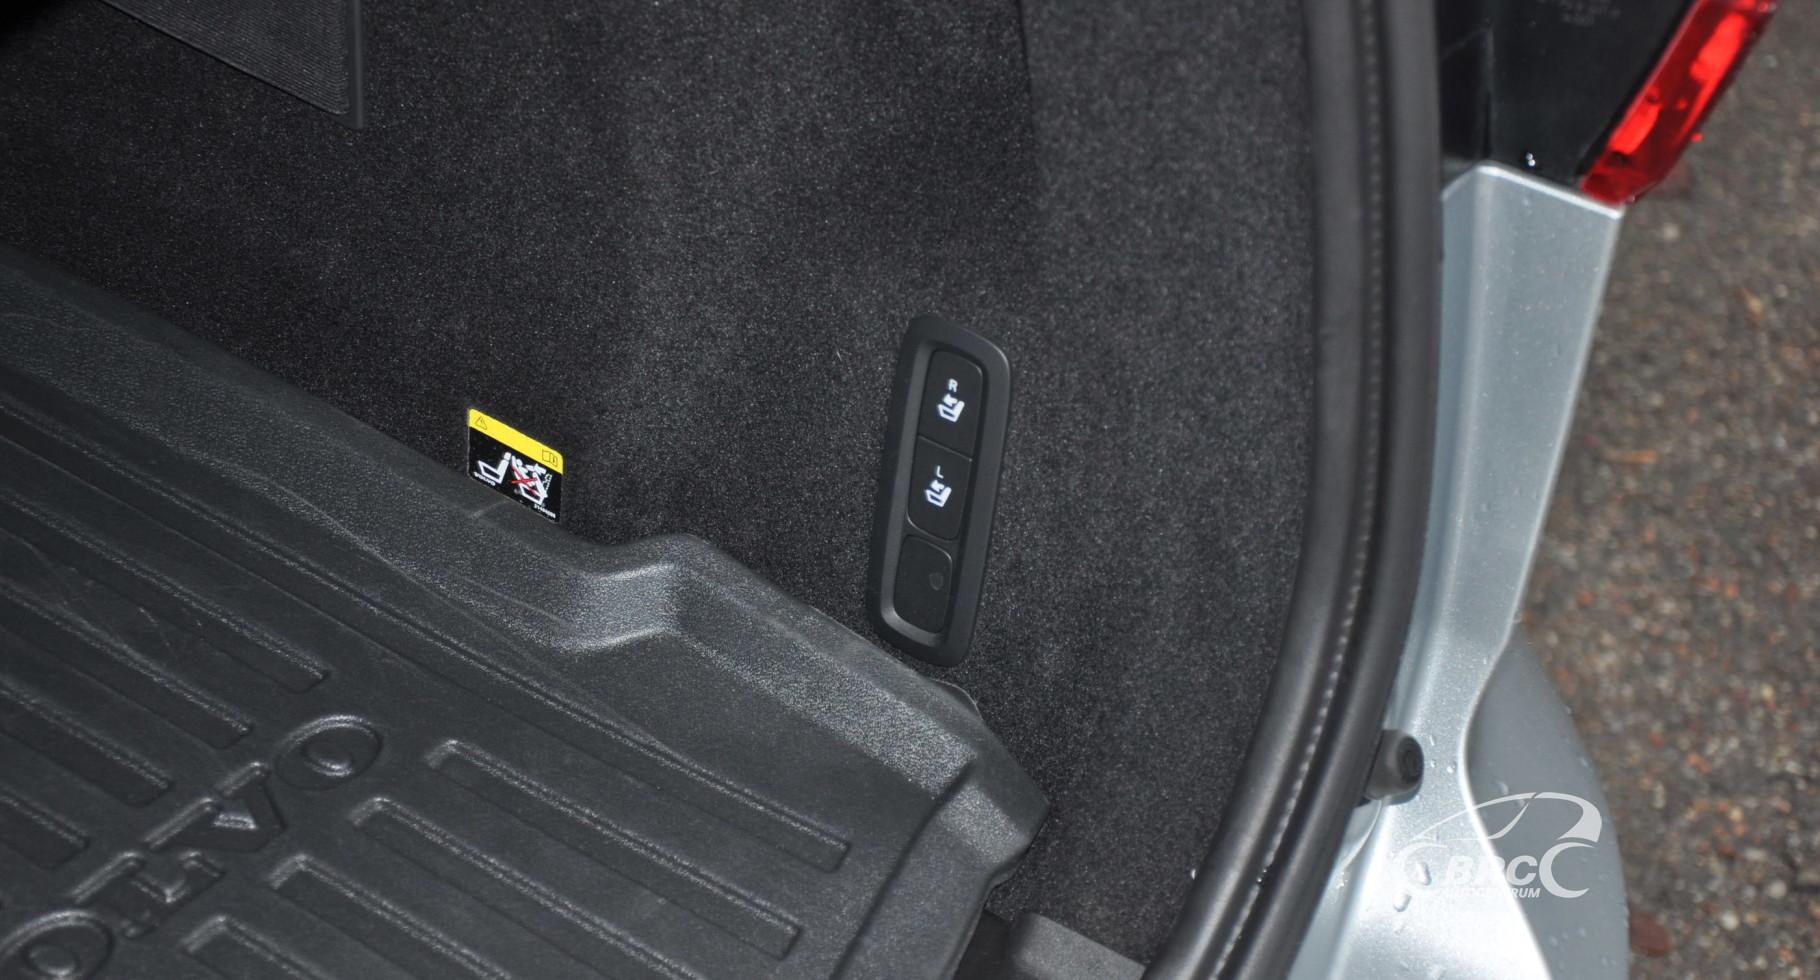 Volvo XC 60 2.0 T6 AWD Automatas